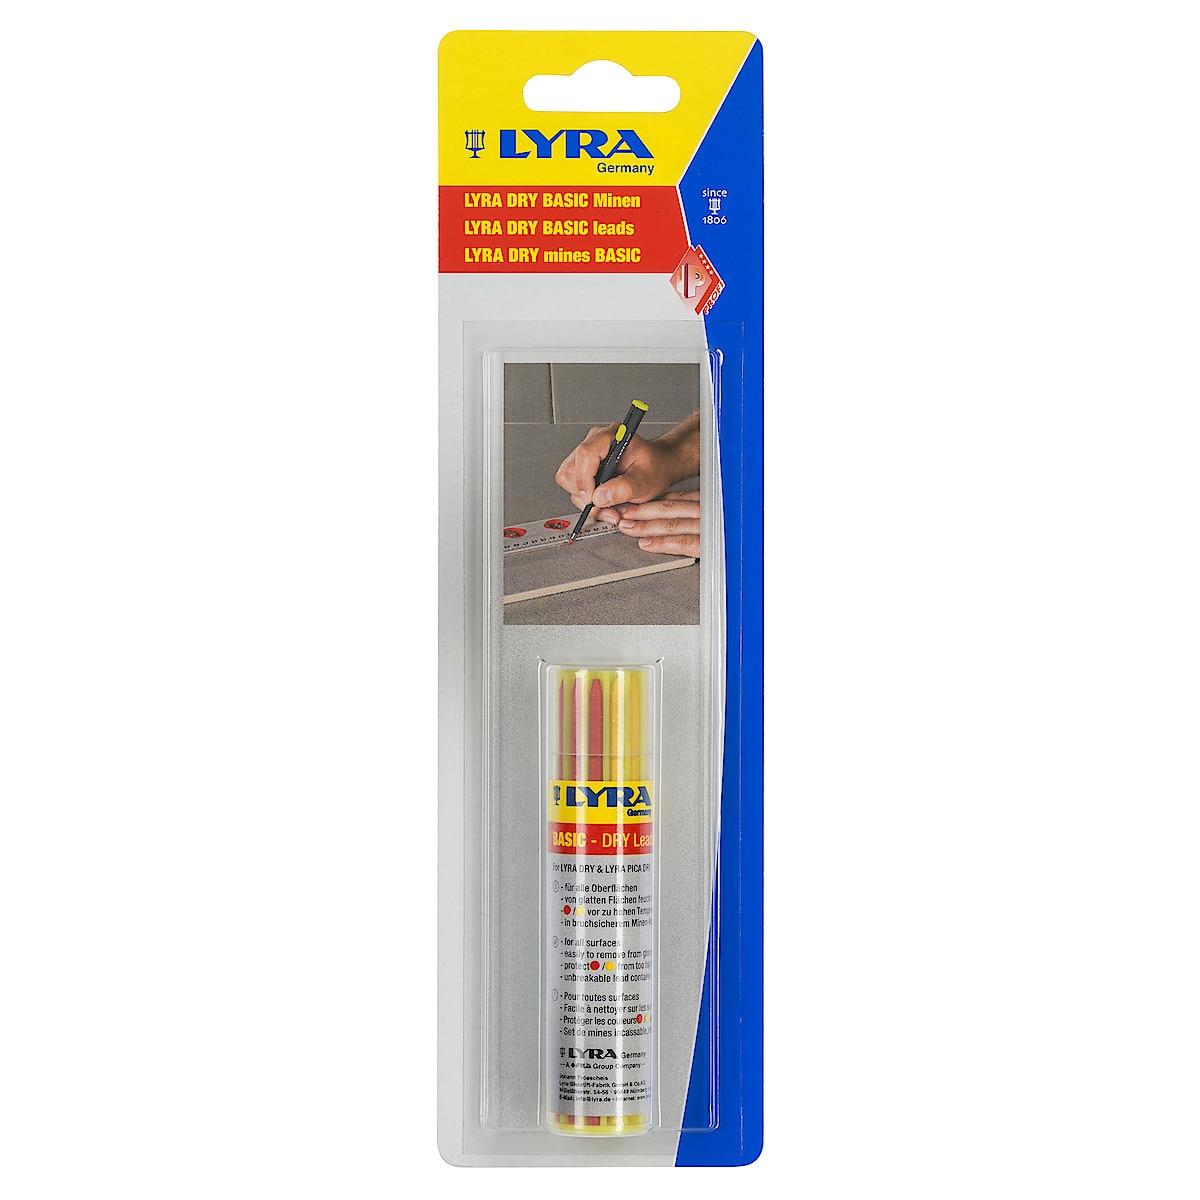 Reservstift Lyra Dry Basic, 12-pack